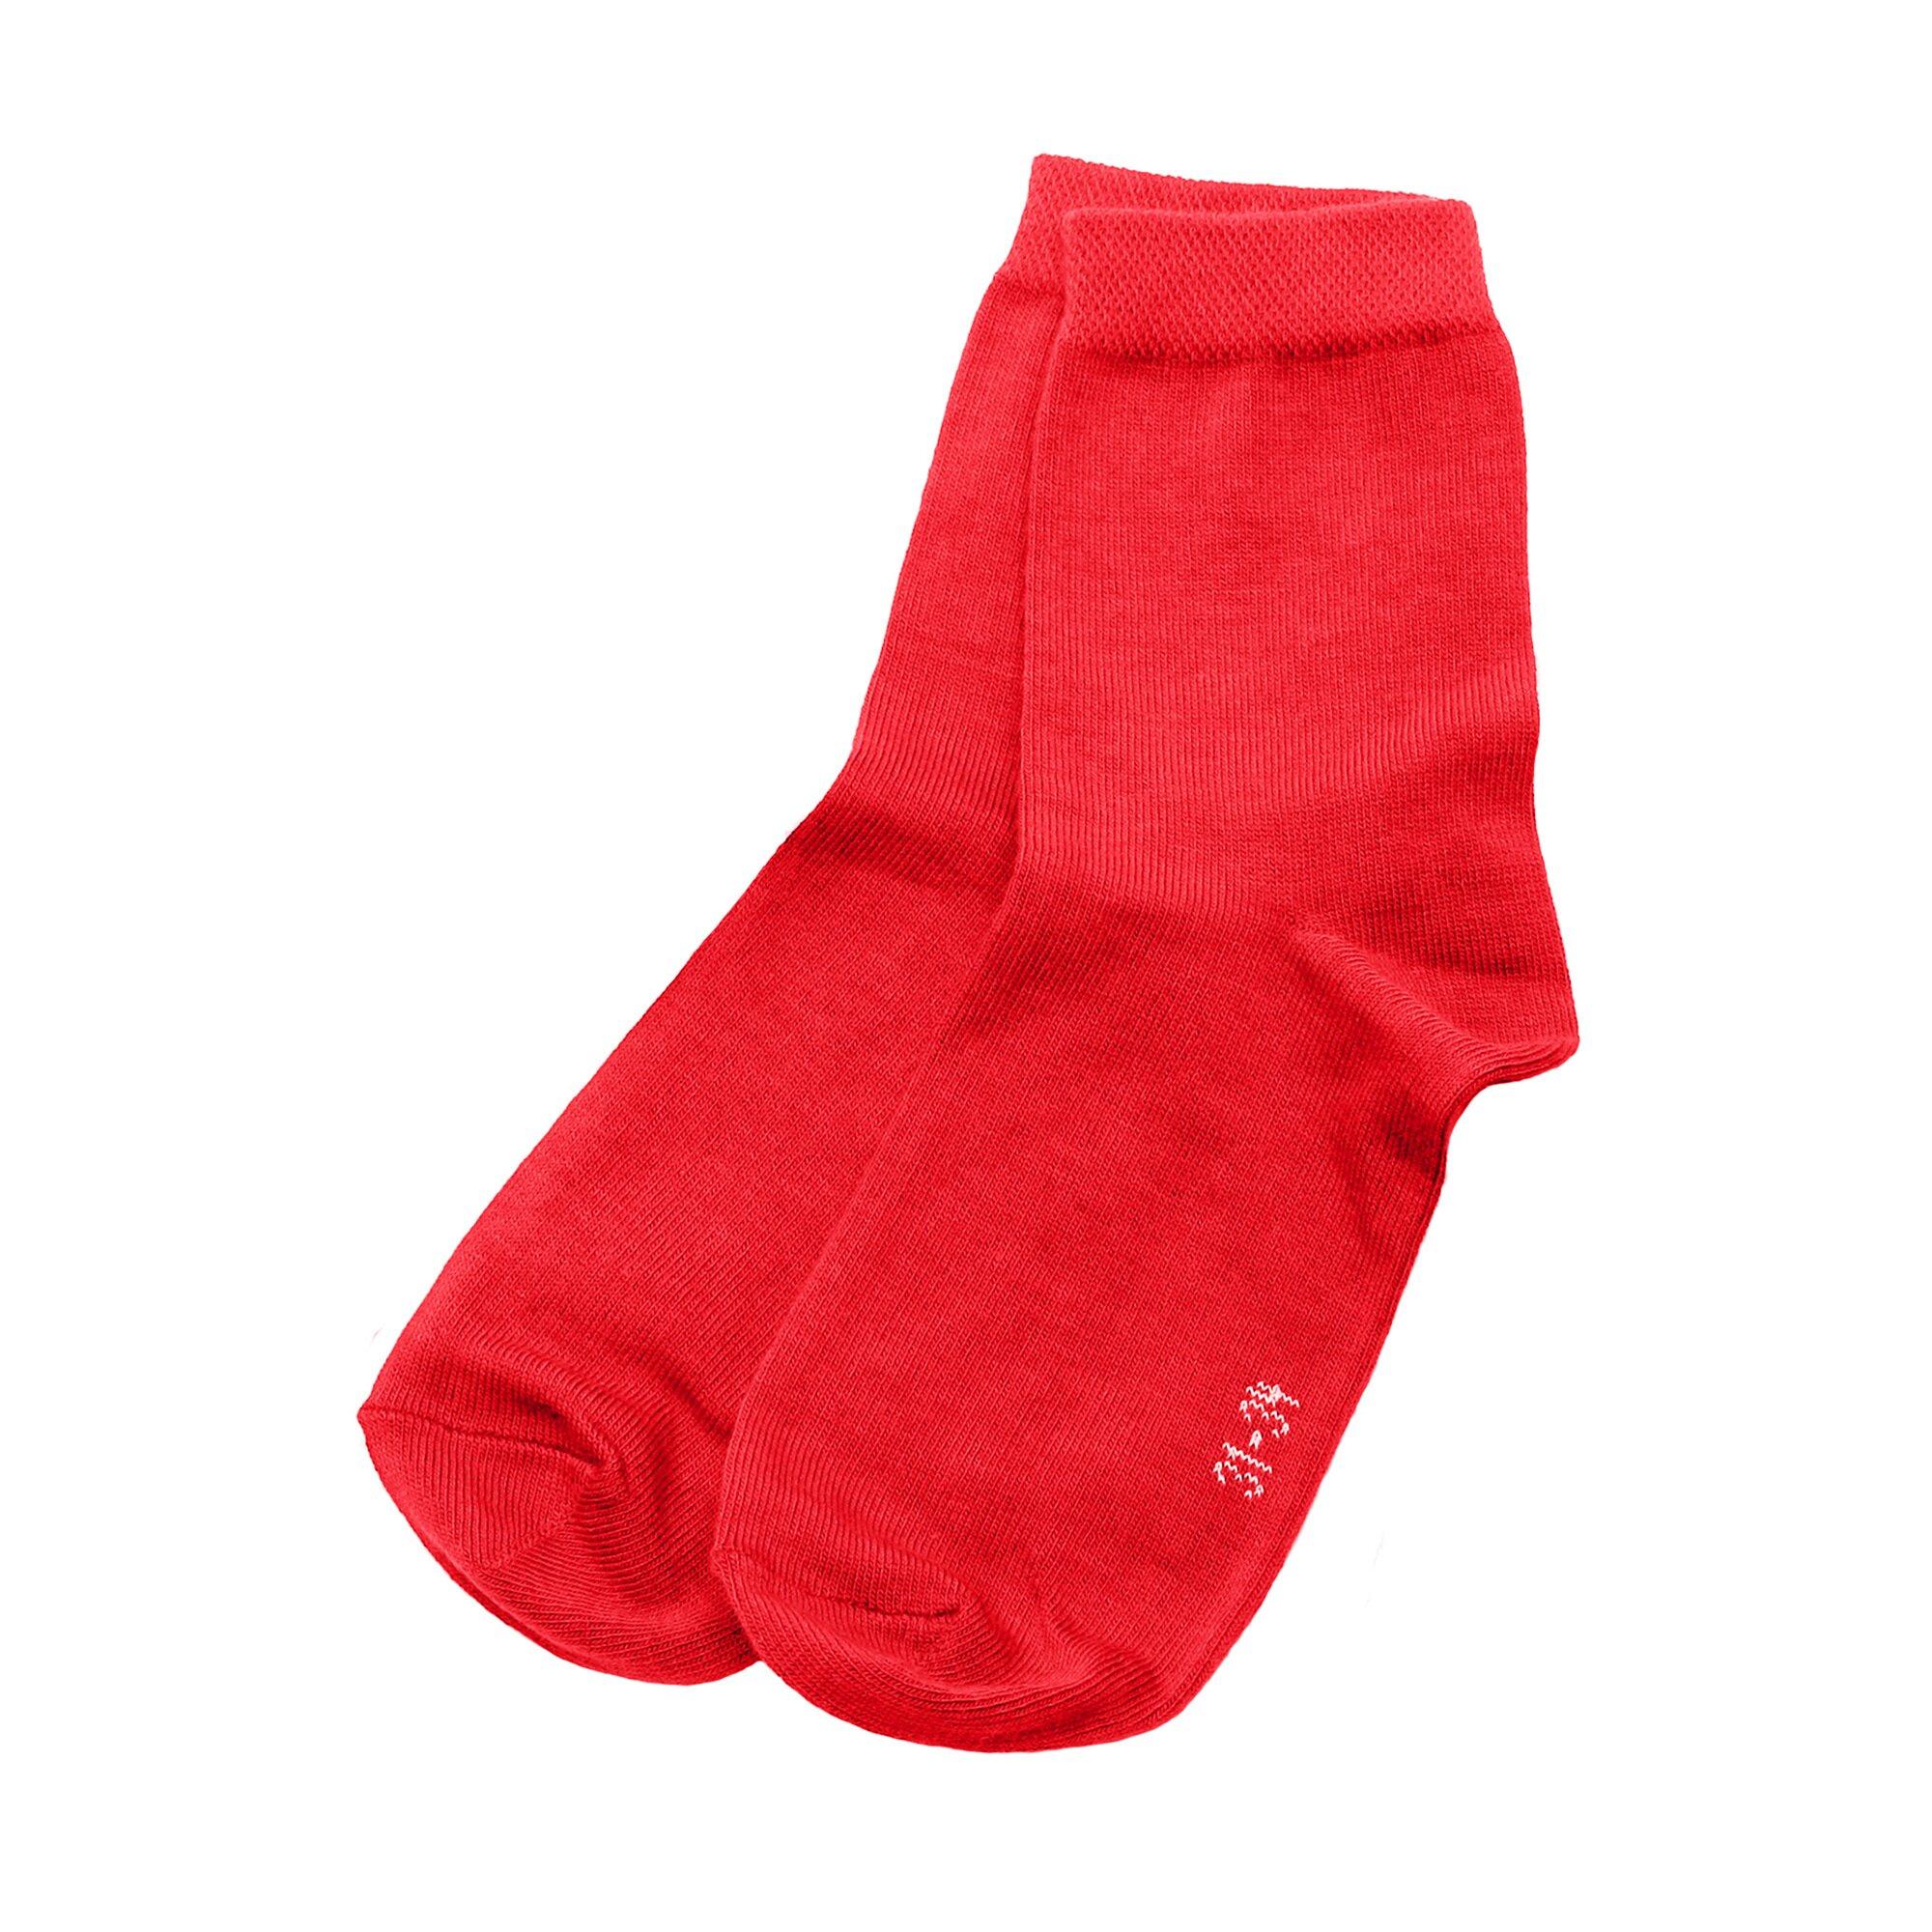 Ewers Socken pink 15-/16-/17-/18-/19-/23-/27-/31